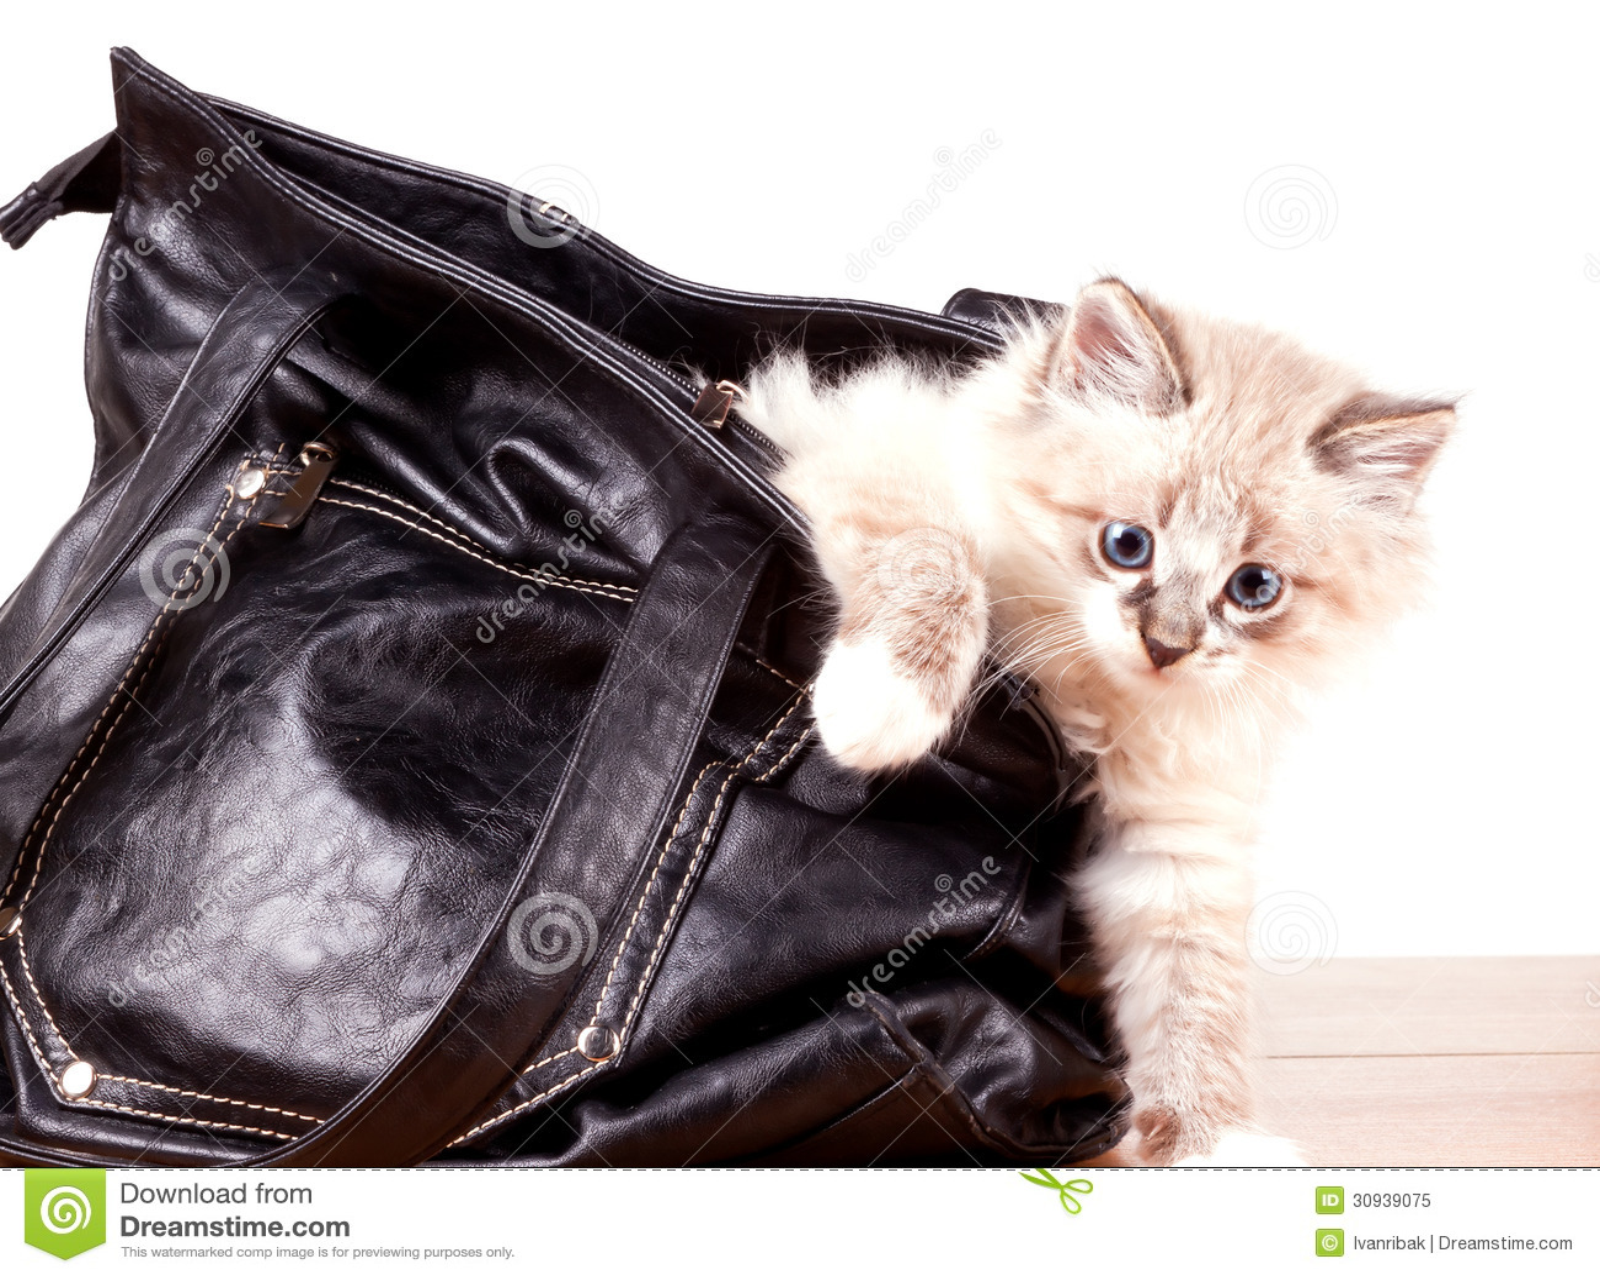 Le petit minou sort du sac